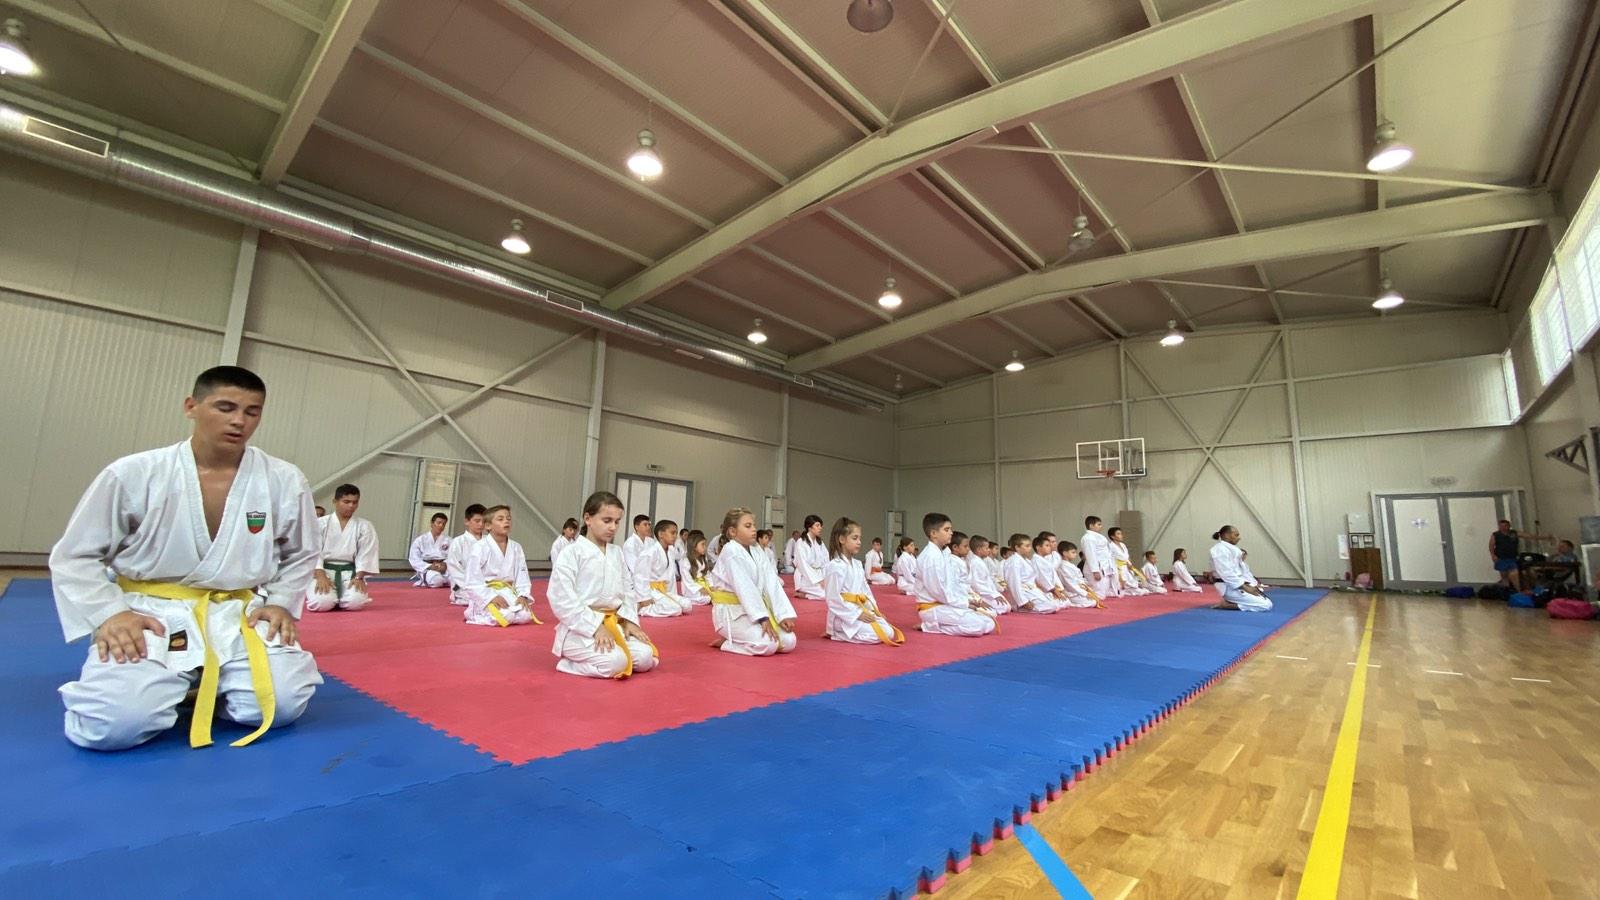 Ивет Горанова поднови тренировки заедно с 500 каратеки